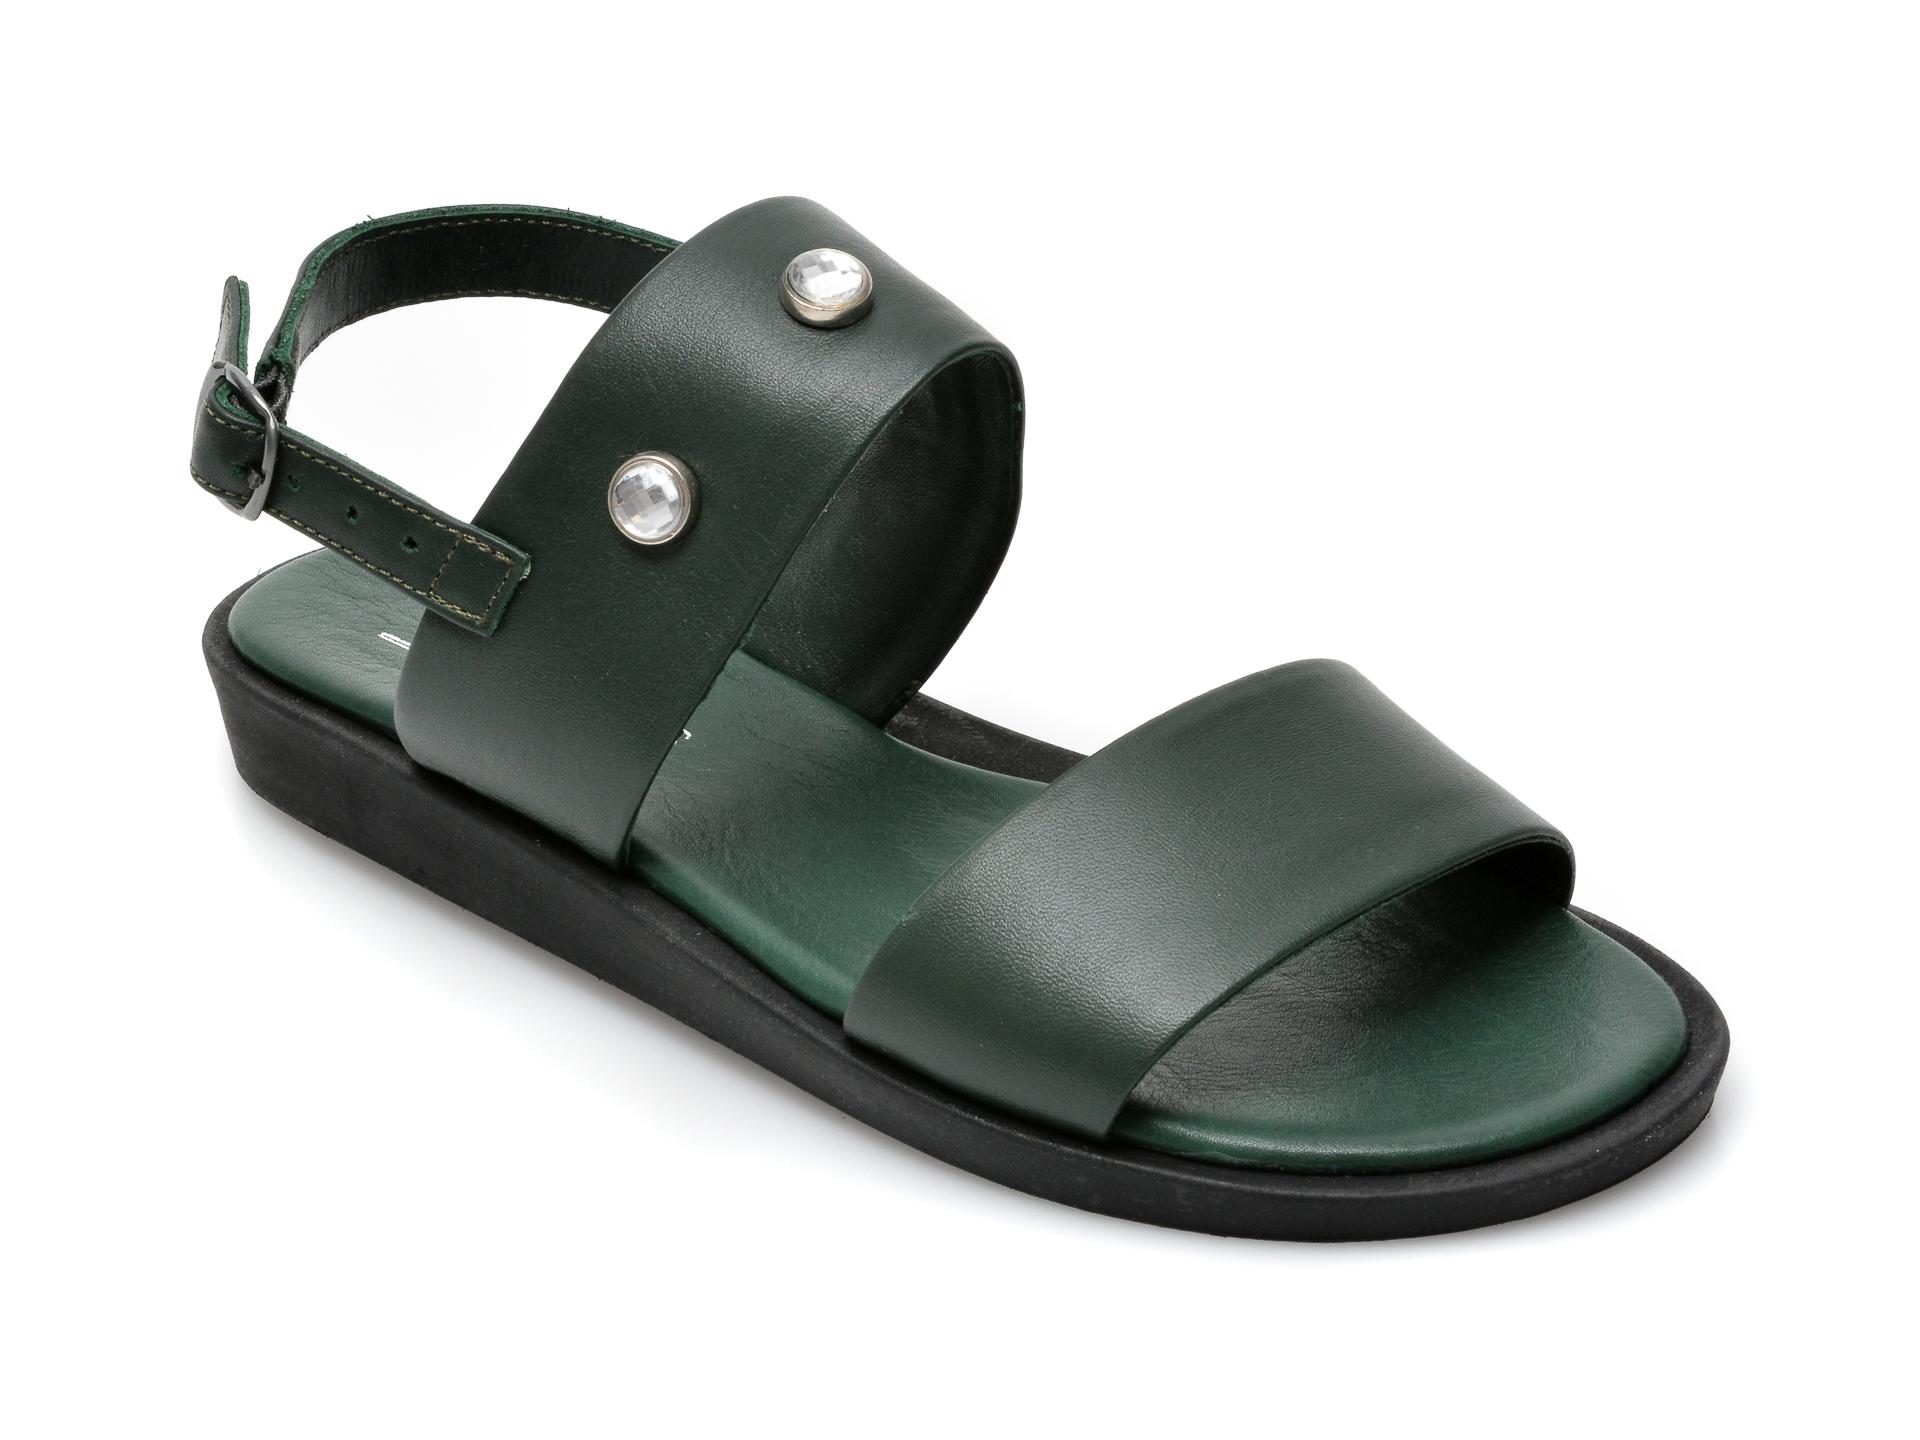 Sandale SCARPEDIEM verzi, 2526SH, din piele naturala